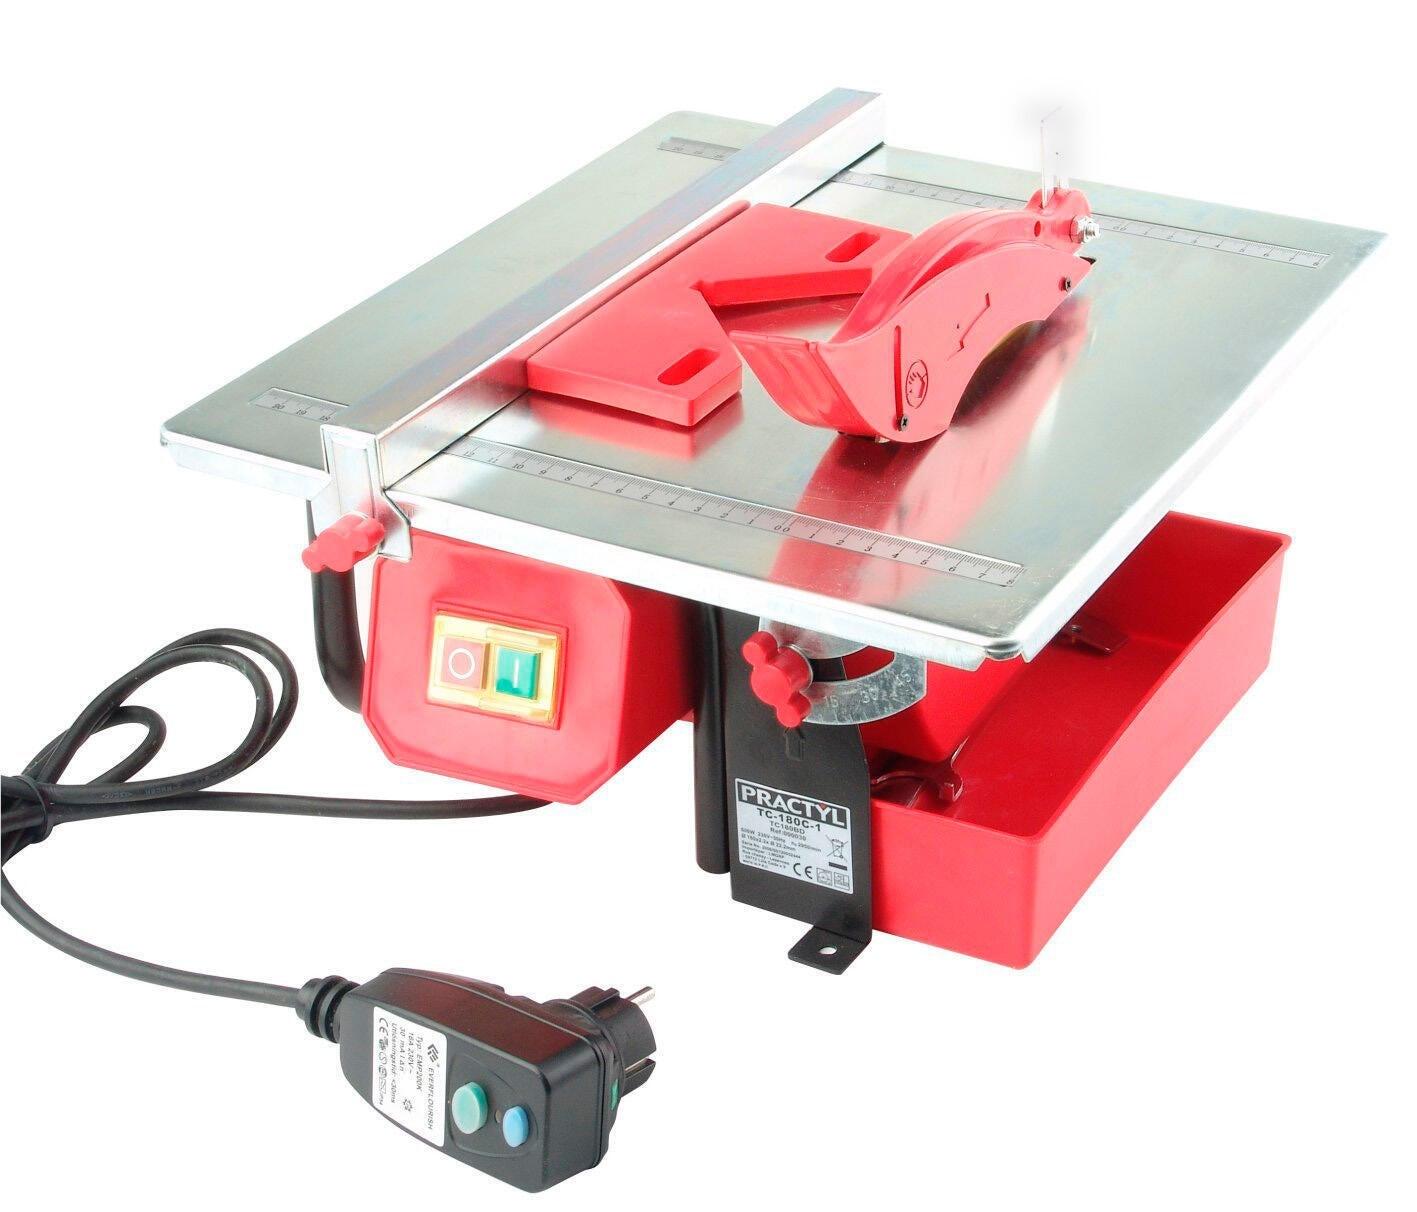 Tagliapiastrelle elettrica PRACTYL Ø disco 180.0 mm, H taglio 33.0 mm, 600.0 W - 2